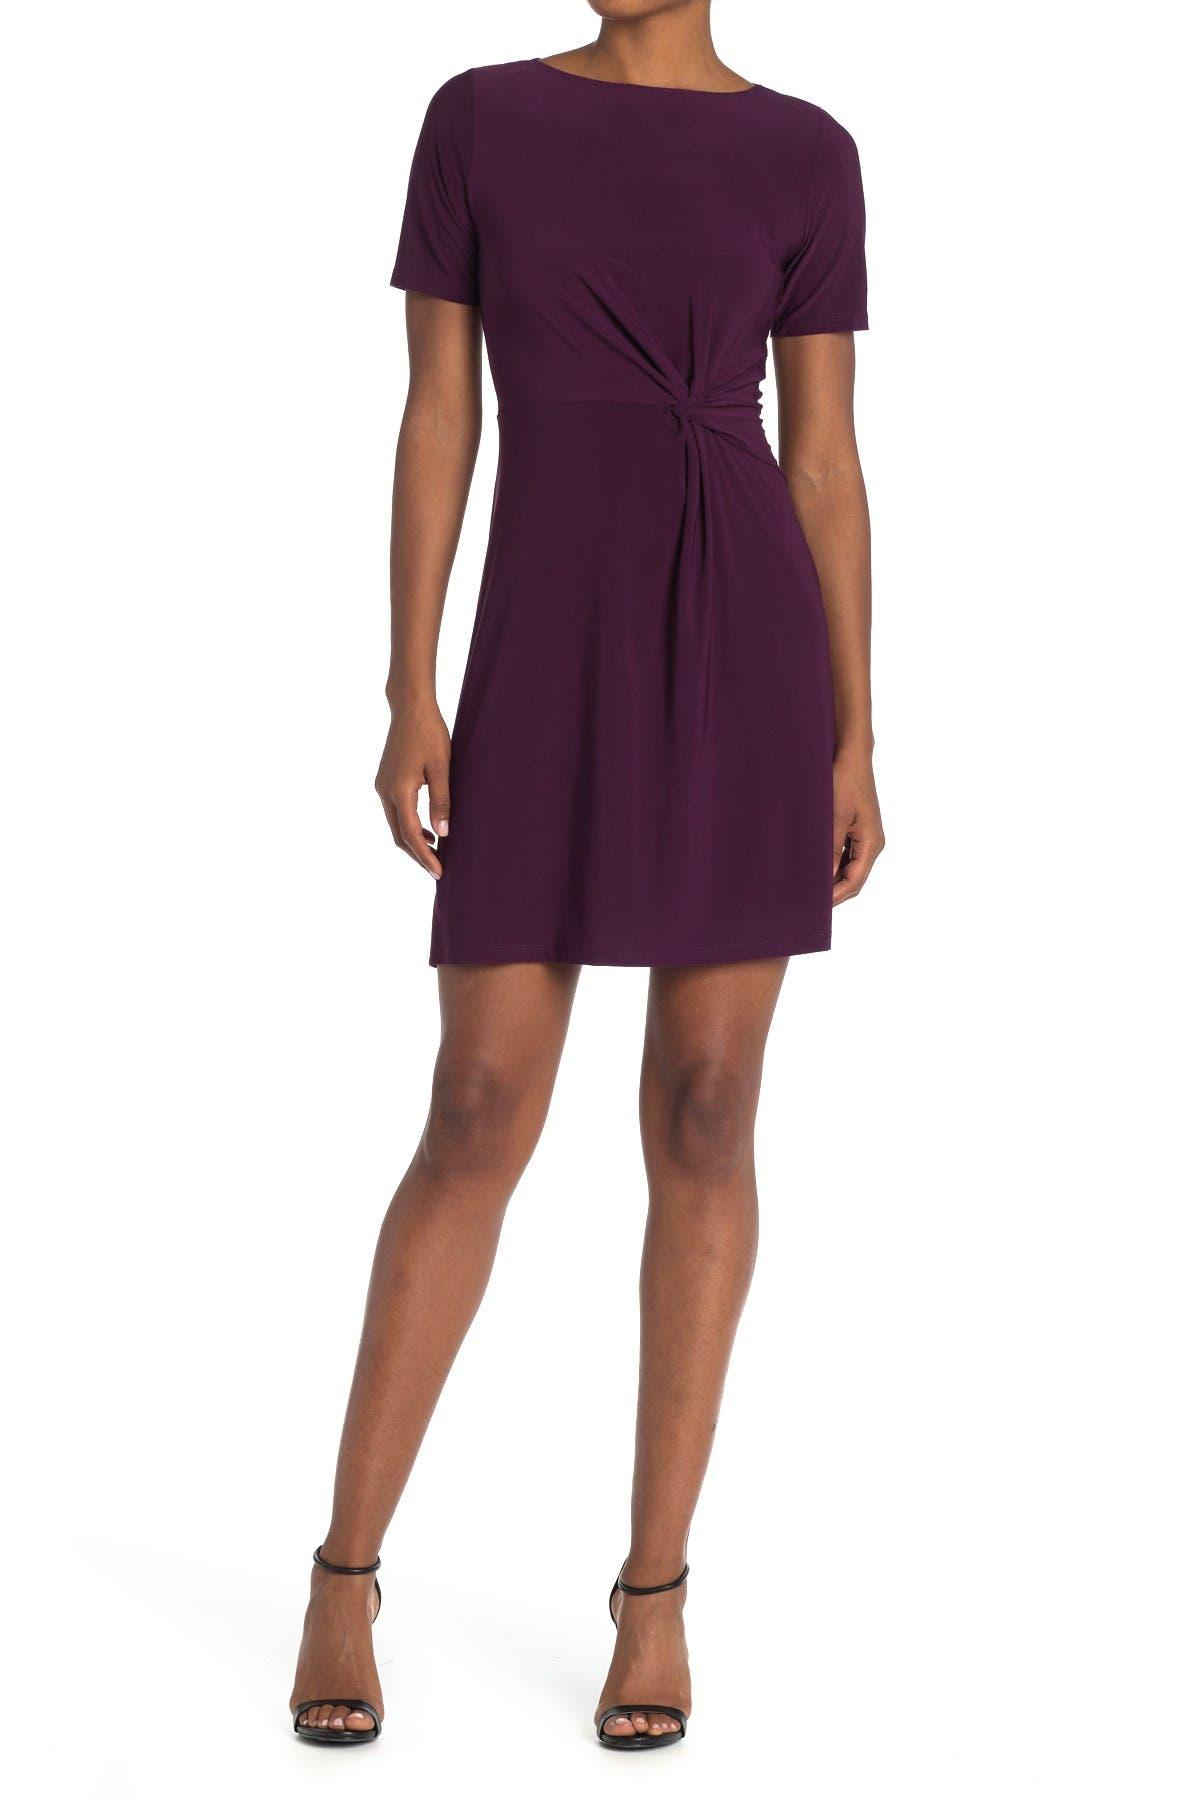 Image of TASH + SOPHIE Short Sleeve Side Twist Dress